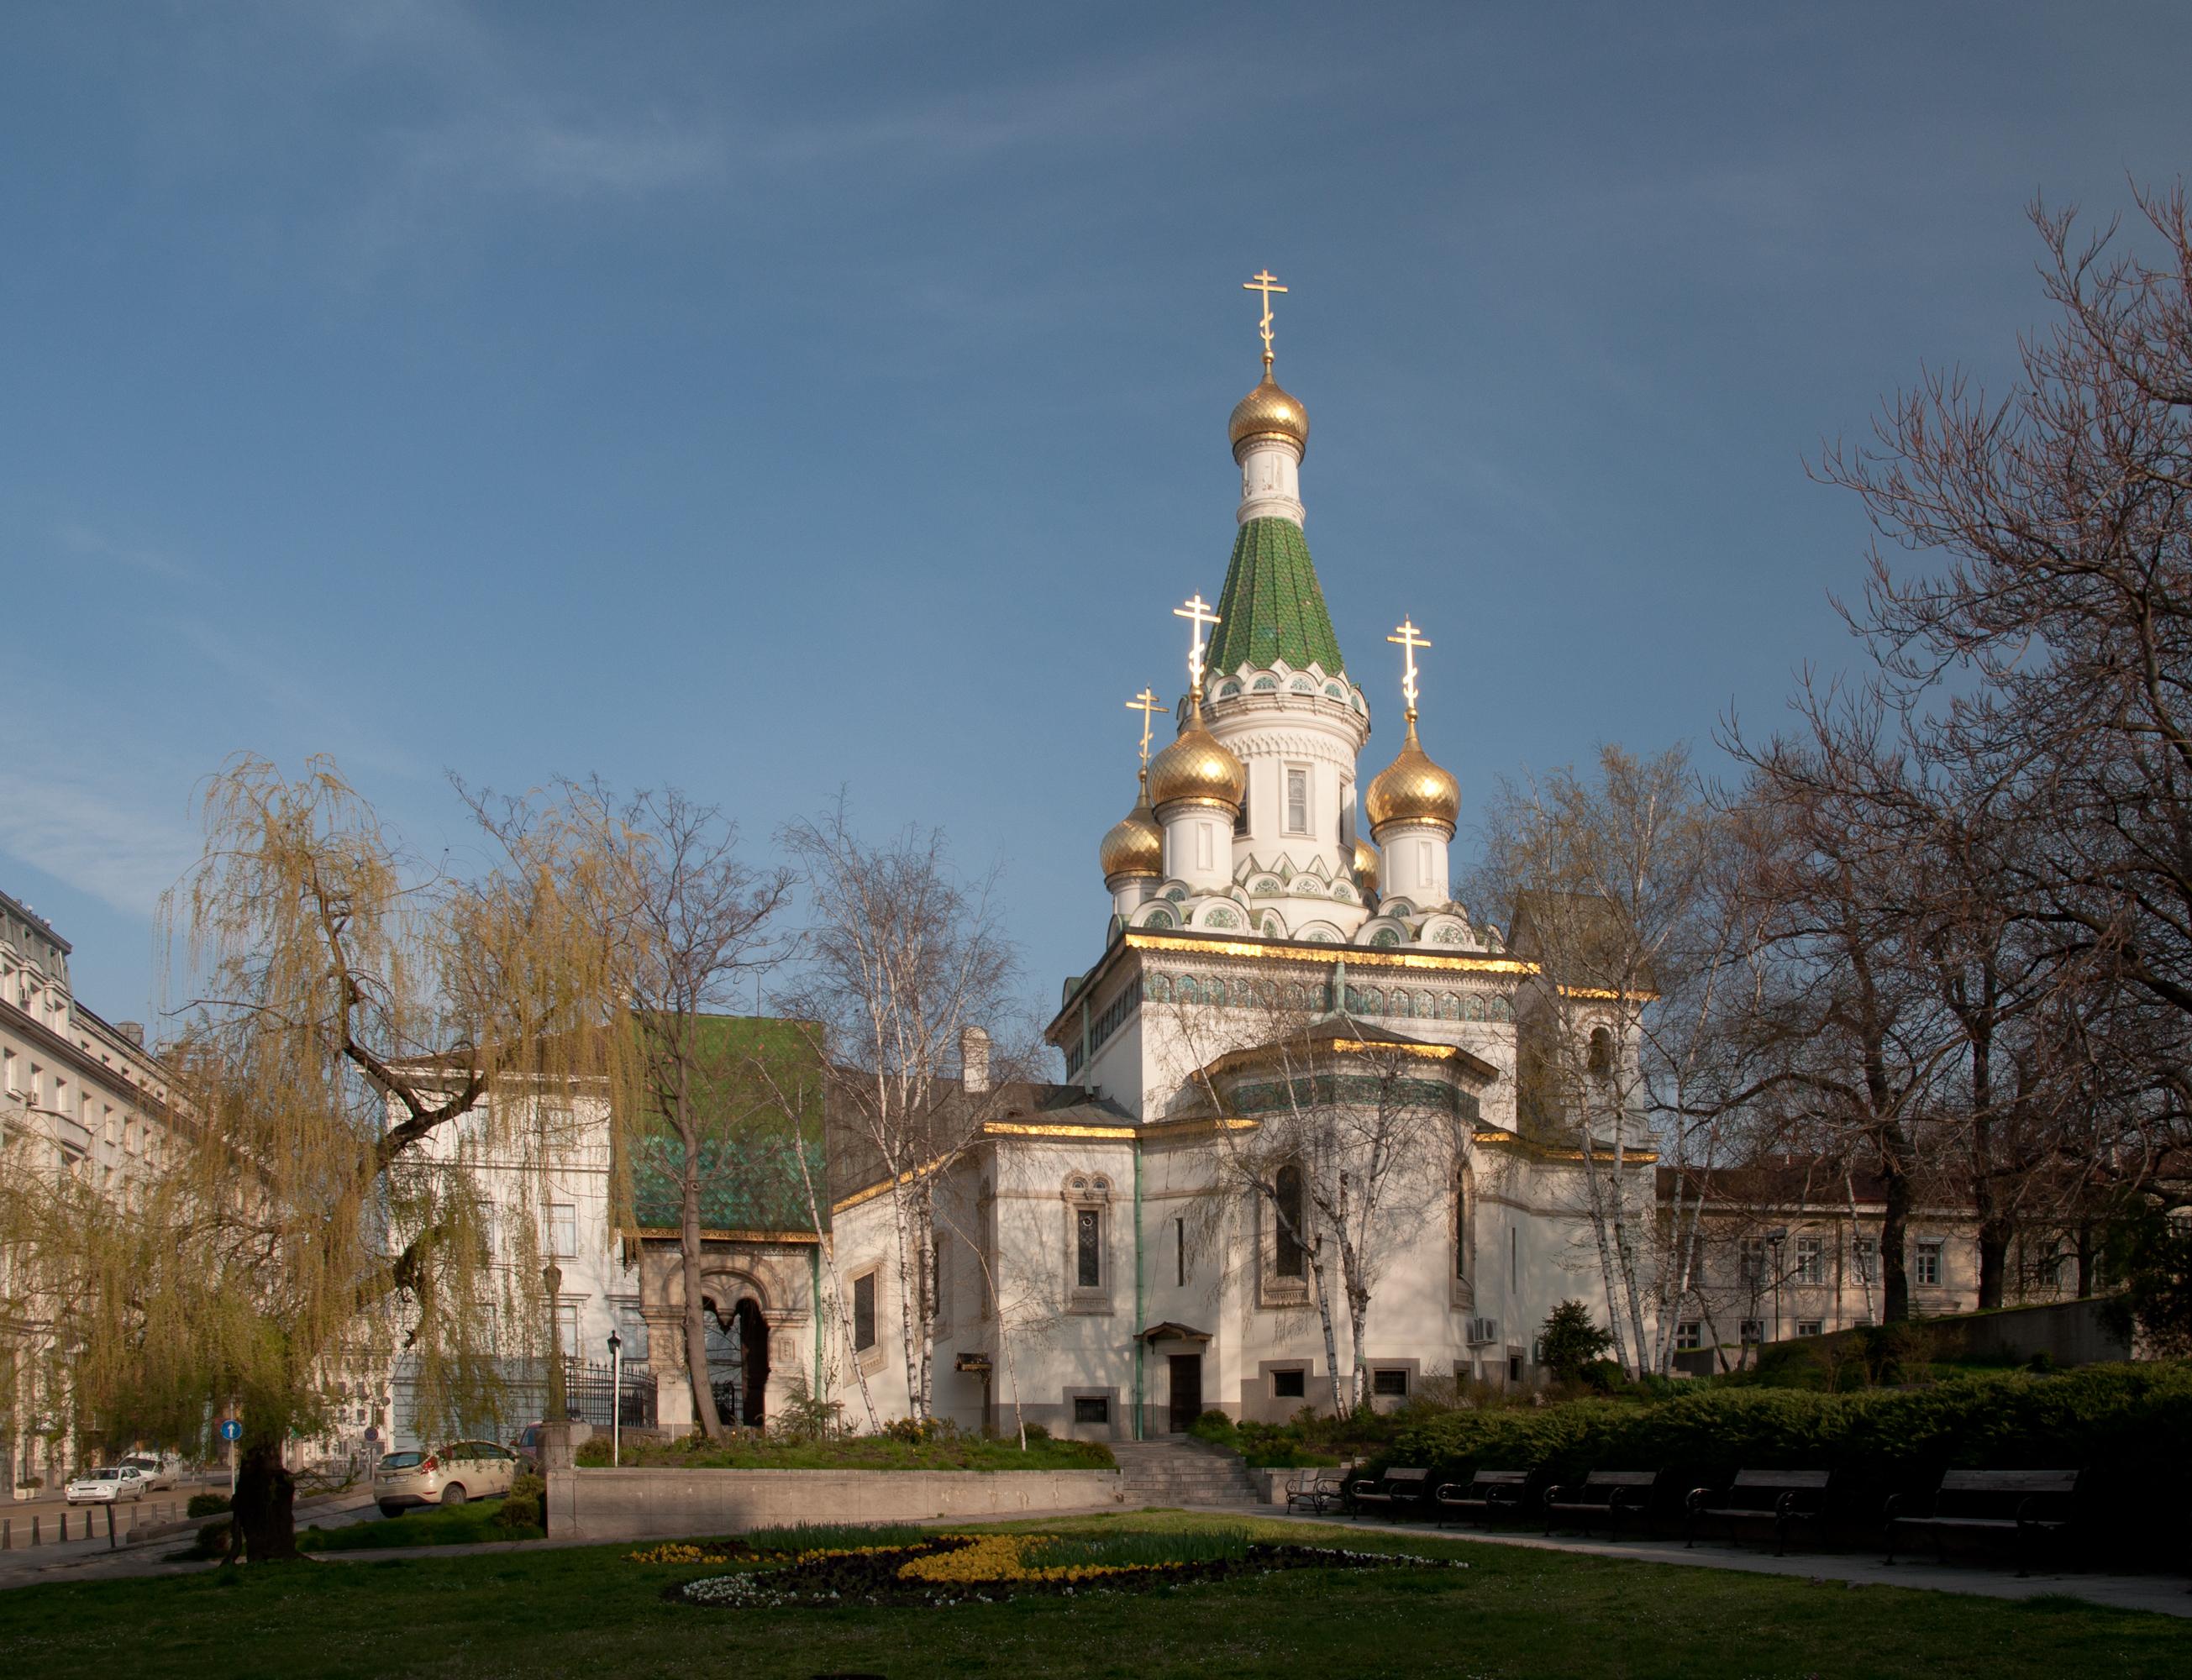 File:Russian church Sofia.jpg - Wikimedia Commons